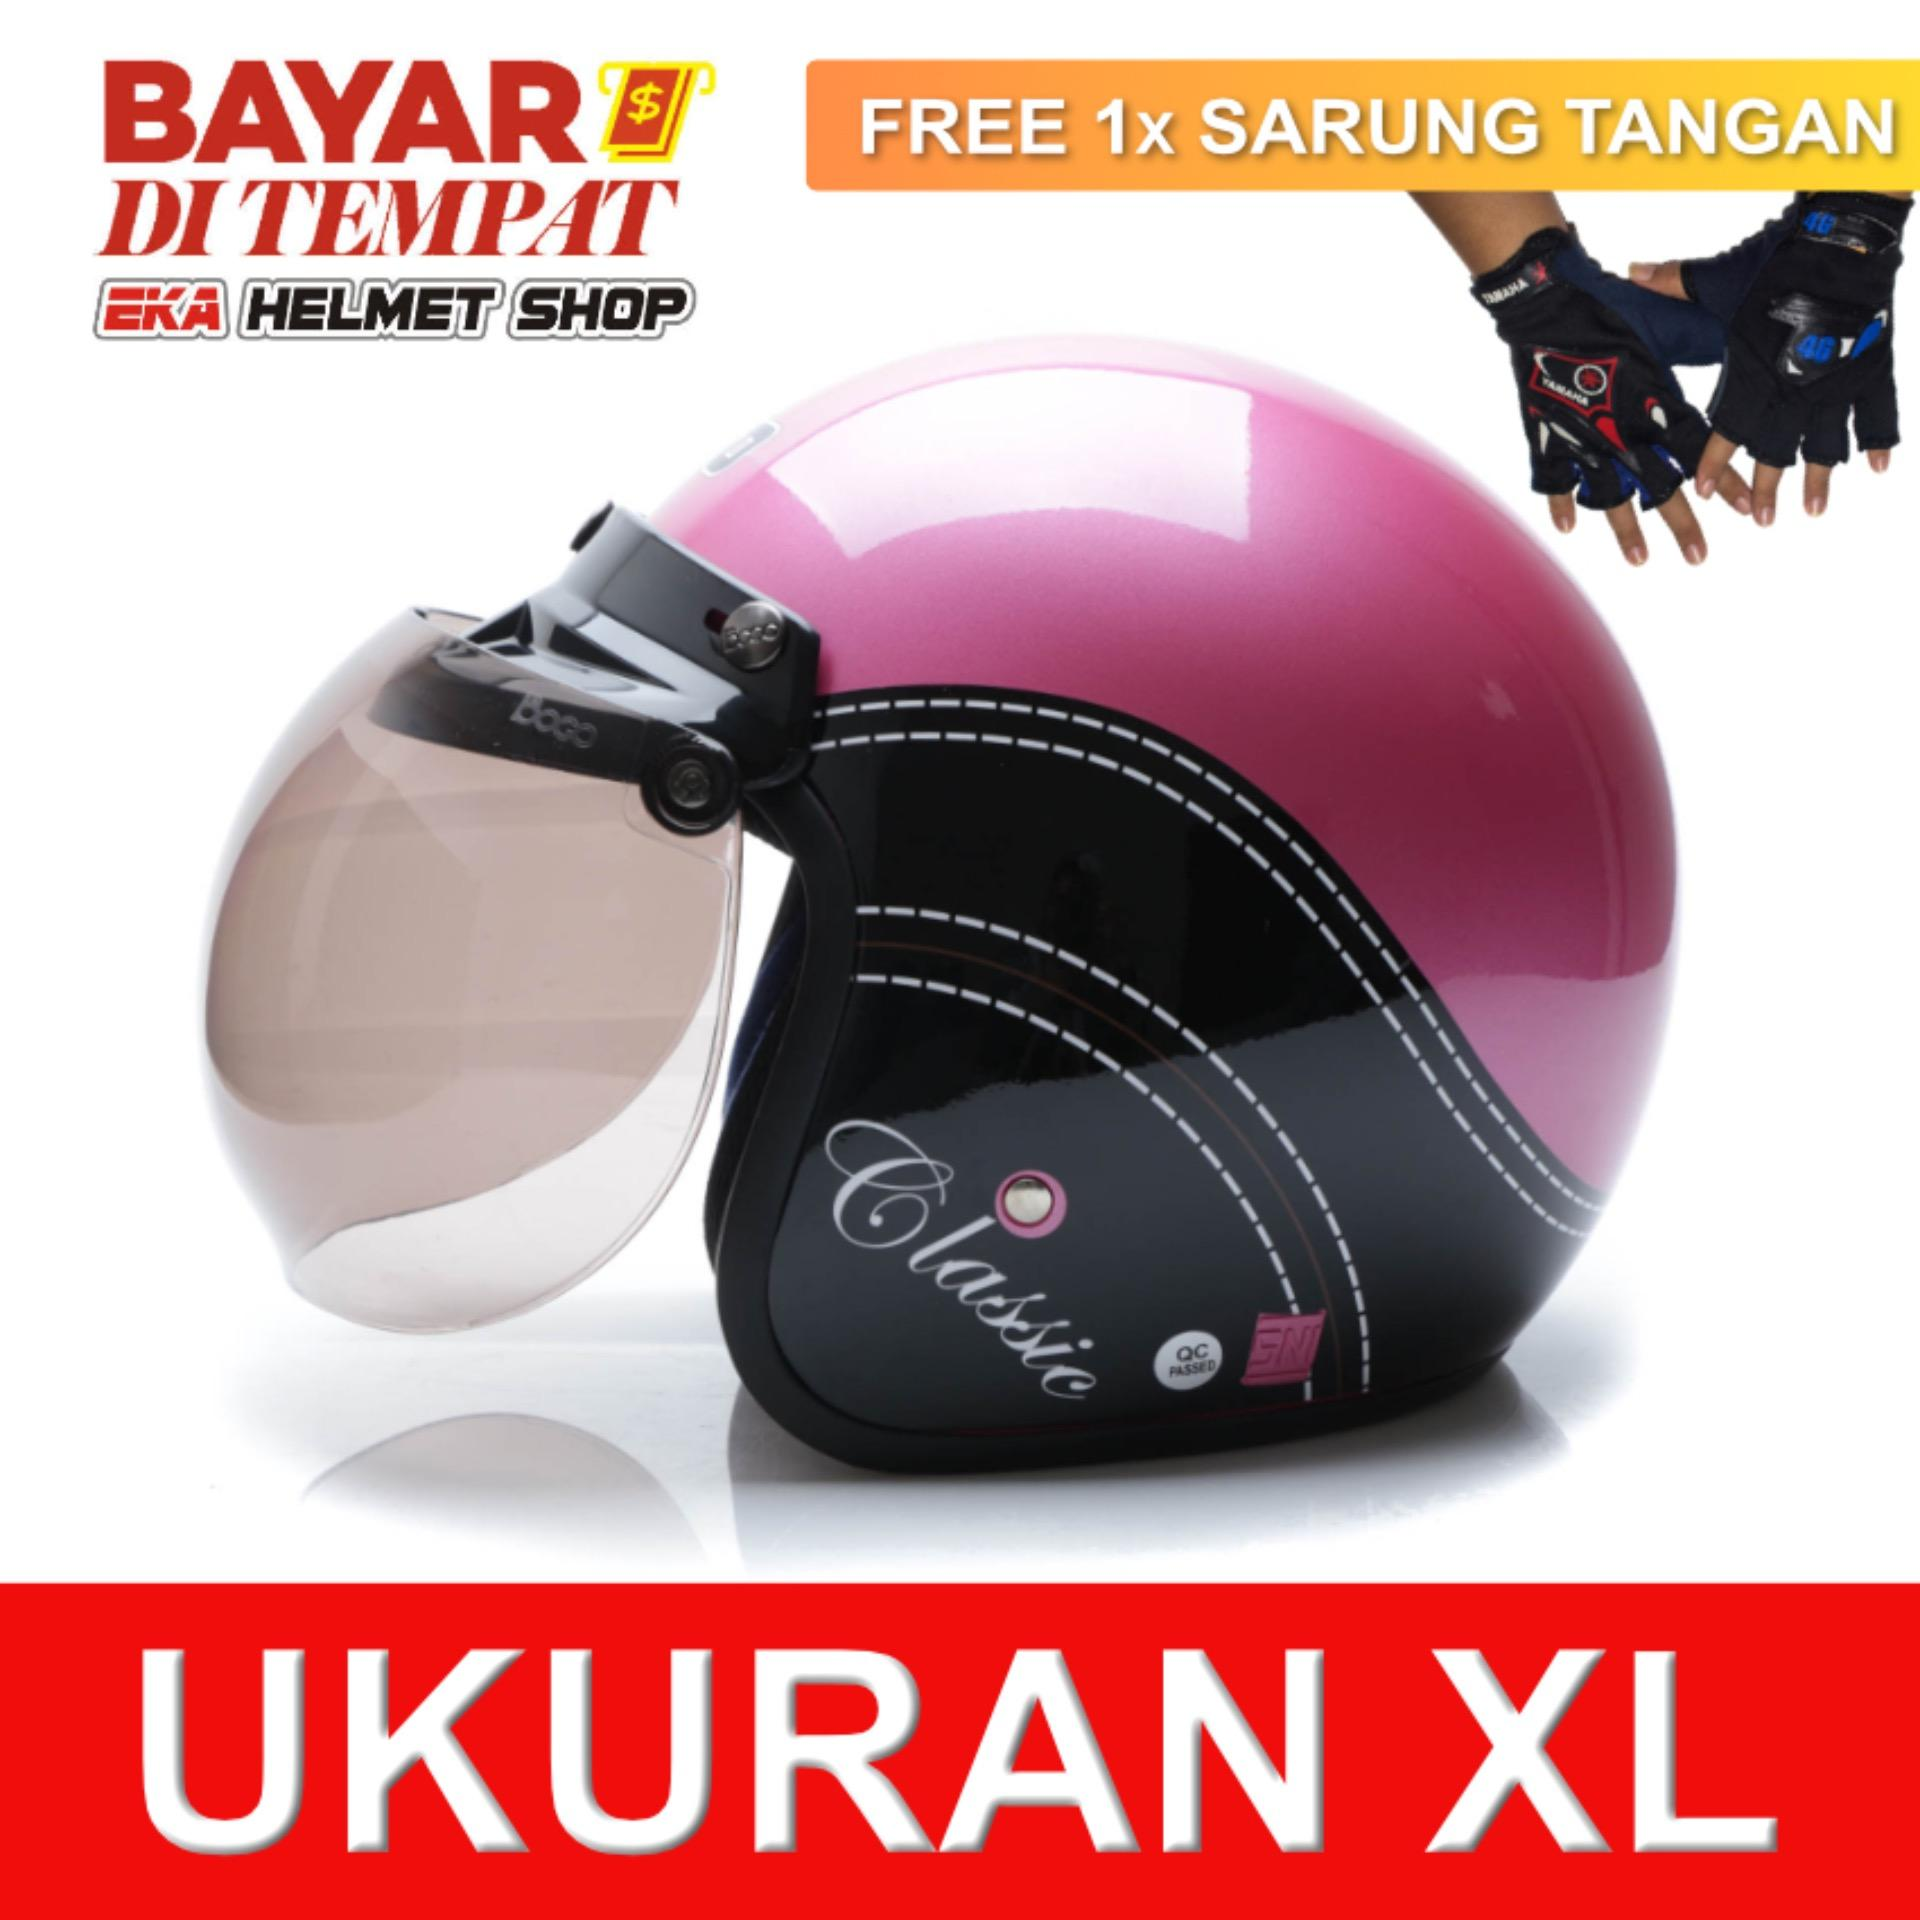 Harga Wto Helmet Retro Bogo Classic Pink Hitam Promo Gratis Sarung Tangan Wto Helmet Original